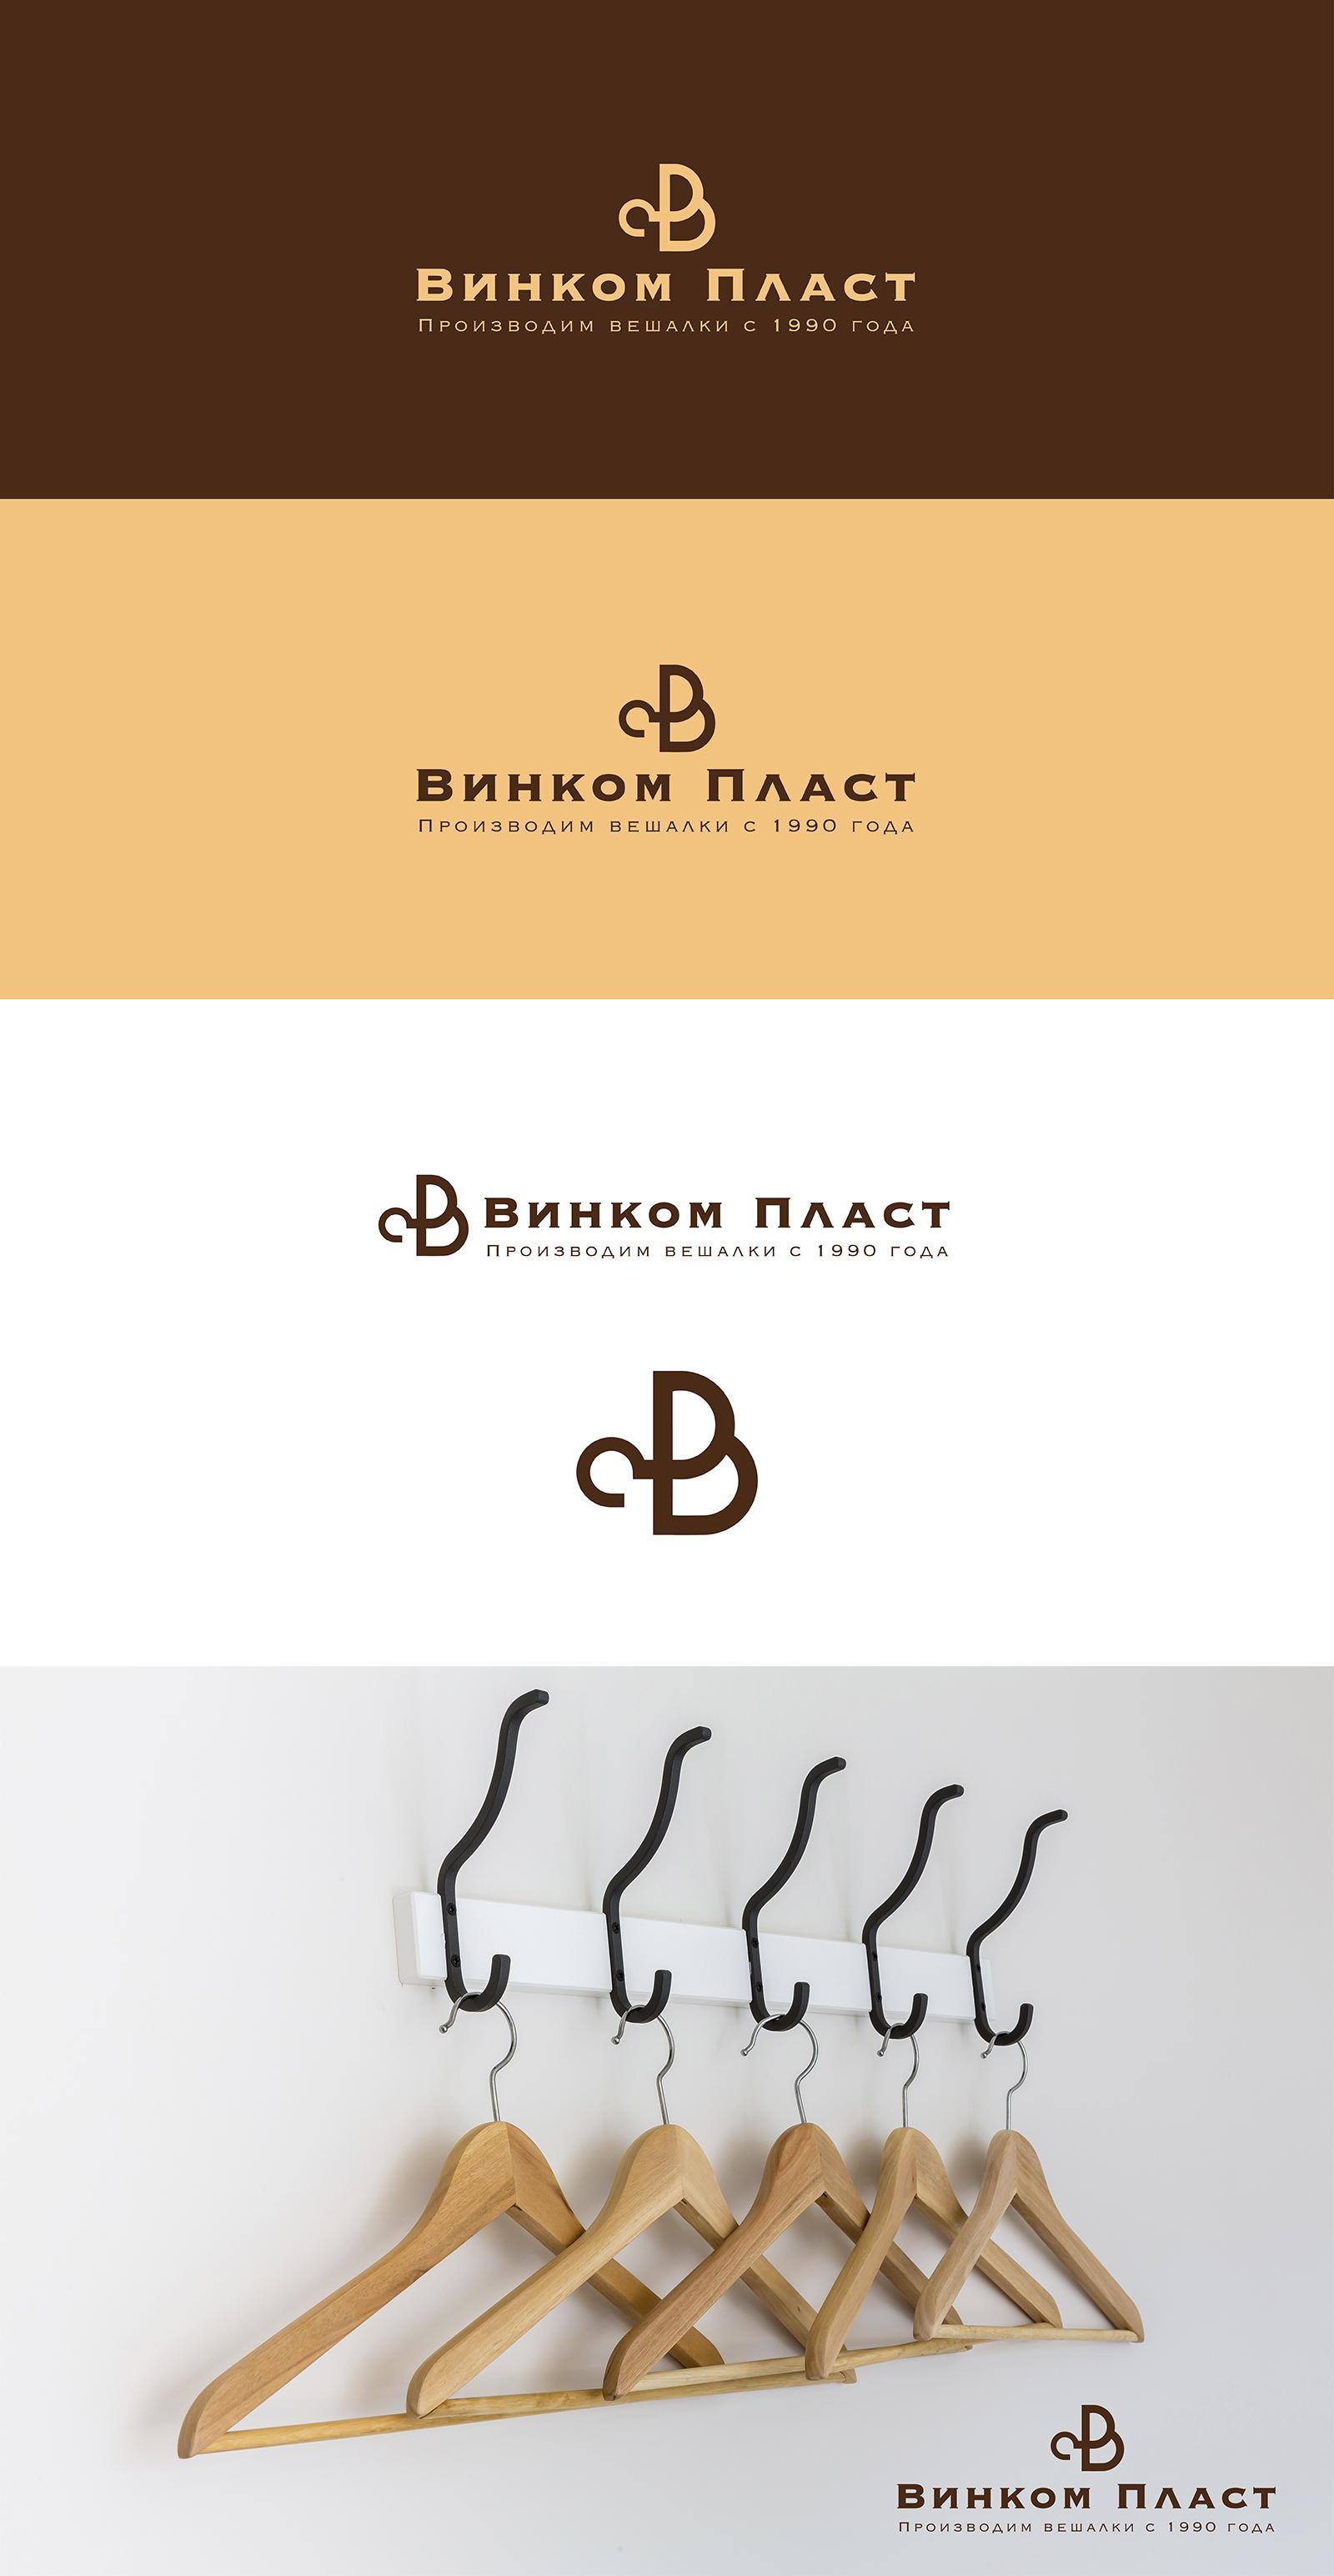 Логотип, фавикон и визитка для компании Винком Пласт  фото f_1665c3c830c5f609.jpg